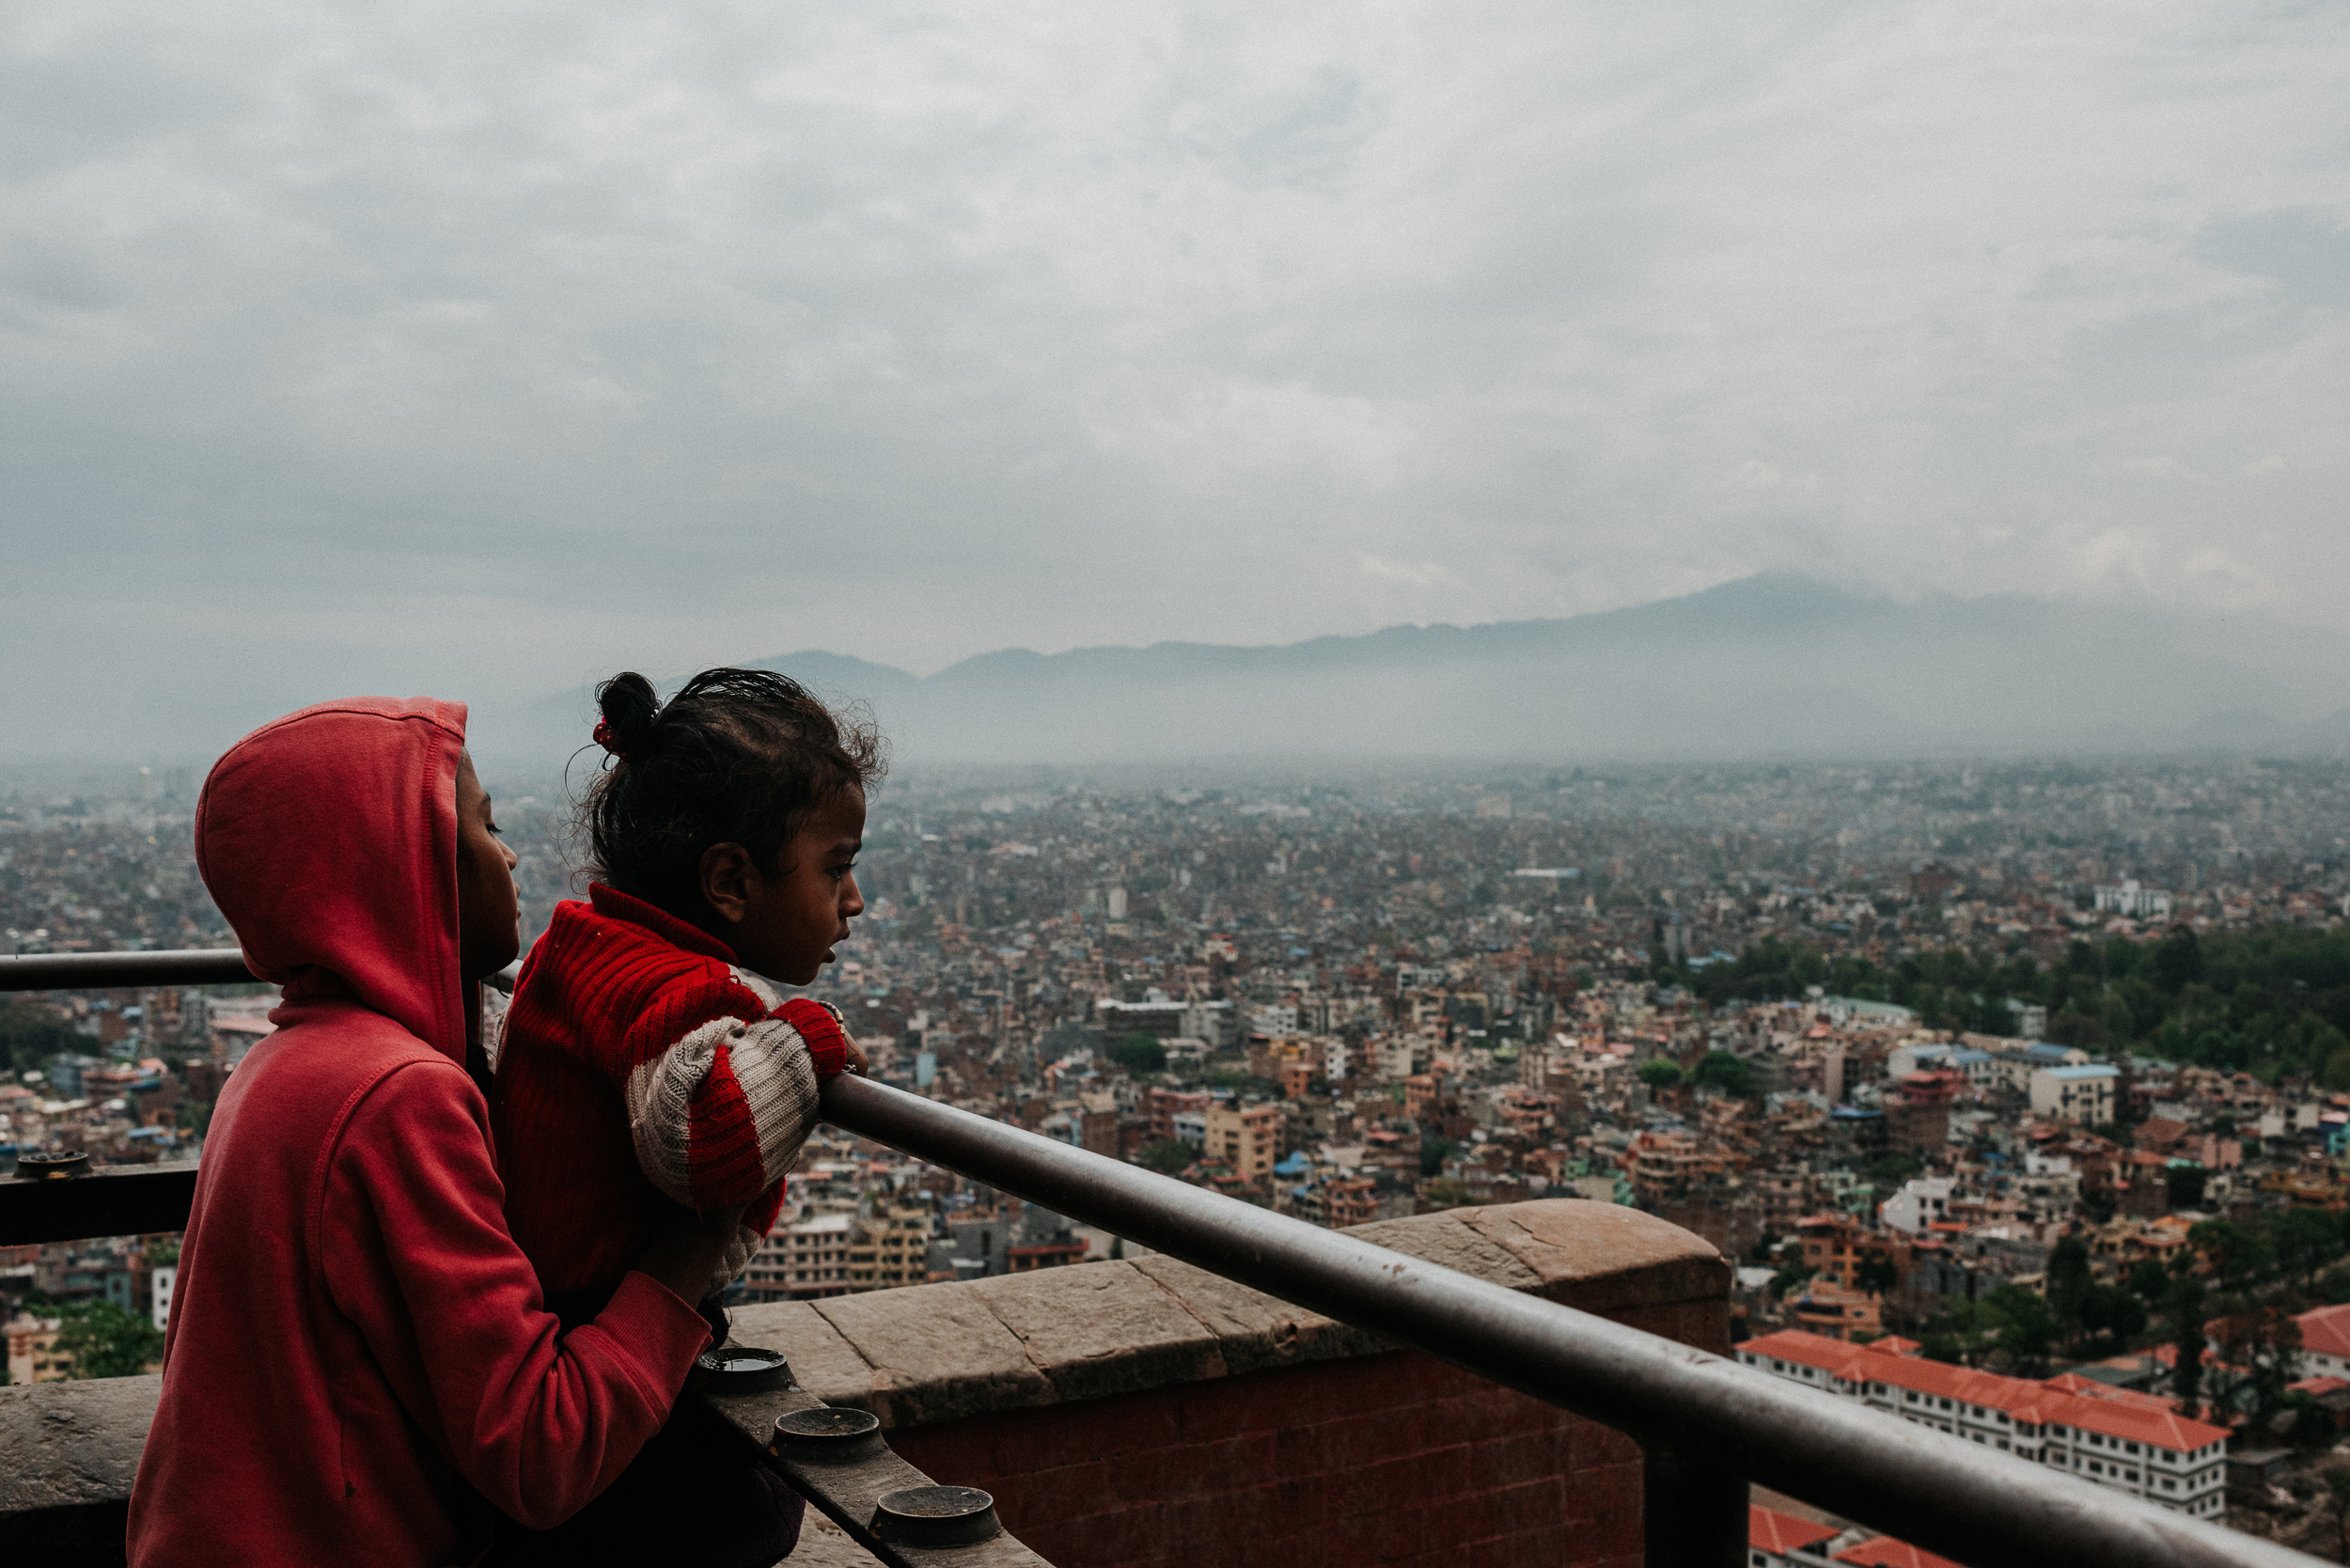 Nepal_EverestBaseCamp_2019_TaraShupe_Photography_DSC_3209.jpg